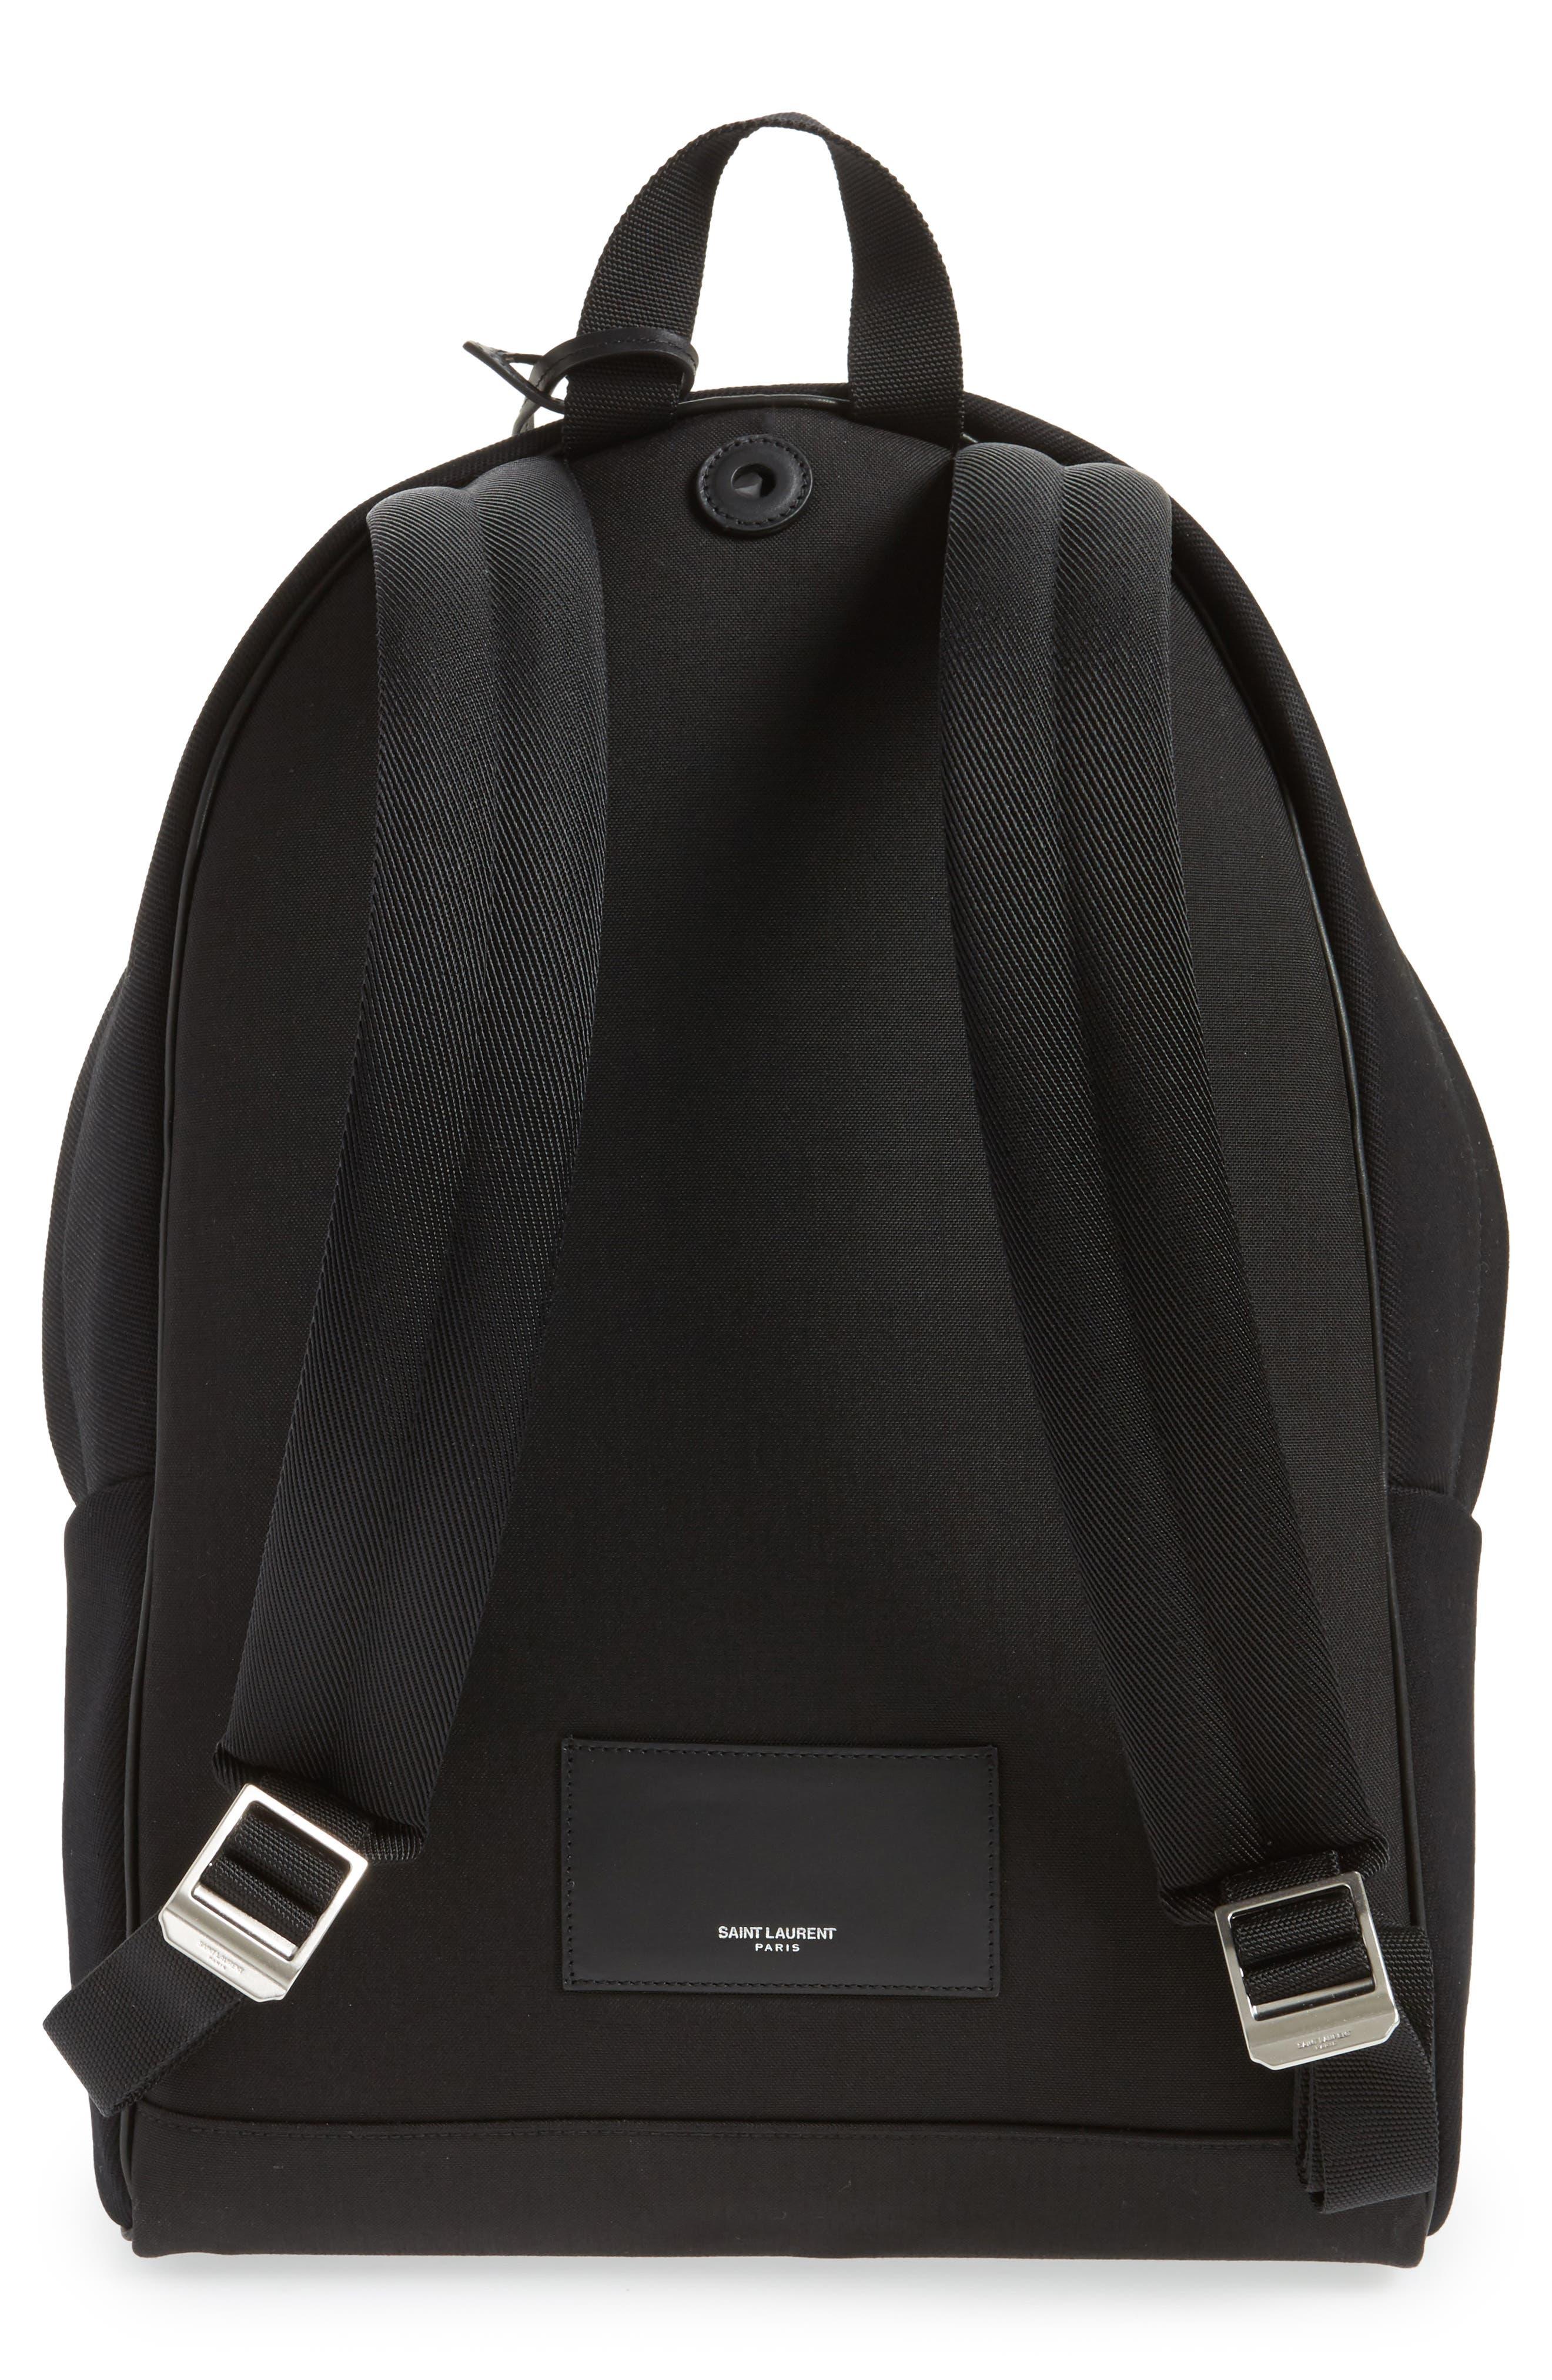 Pattern City Backpack,                             Alternate thumbnail 2, color,                             Black/ White